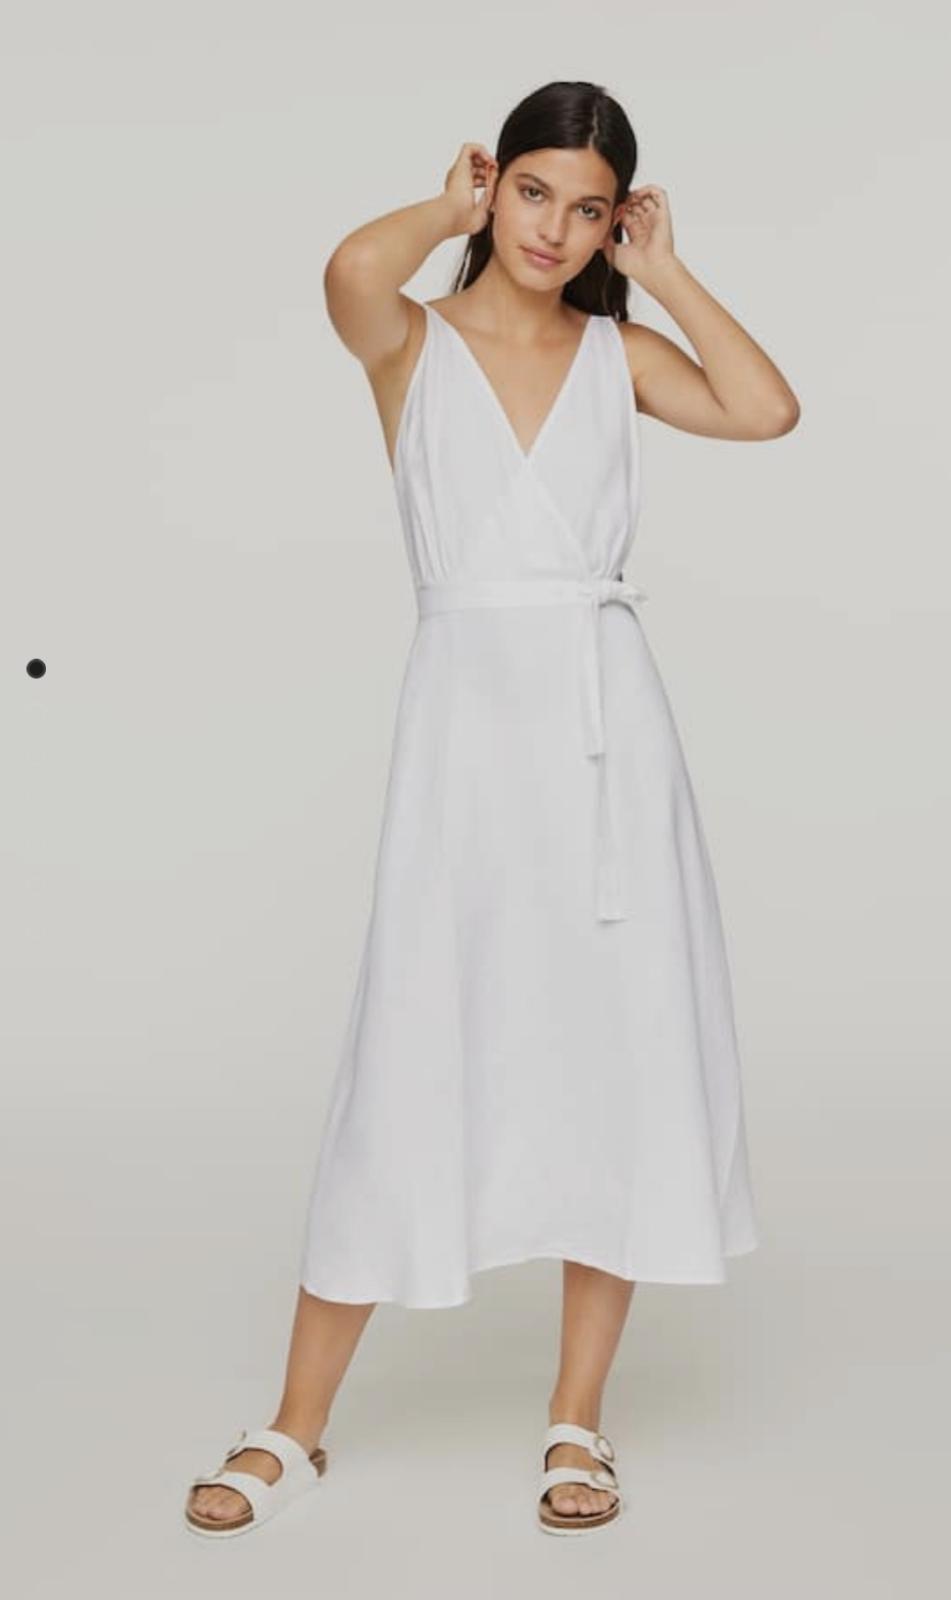 Vestido tirantes de tejido de lino blanco